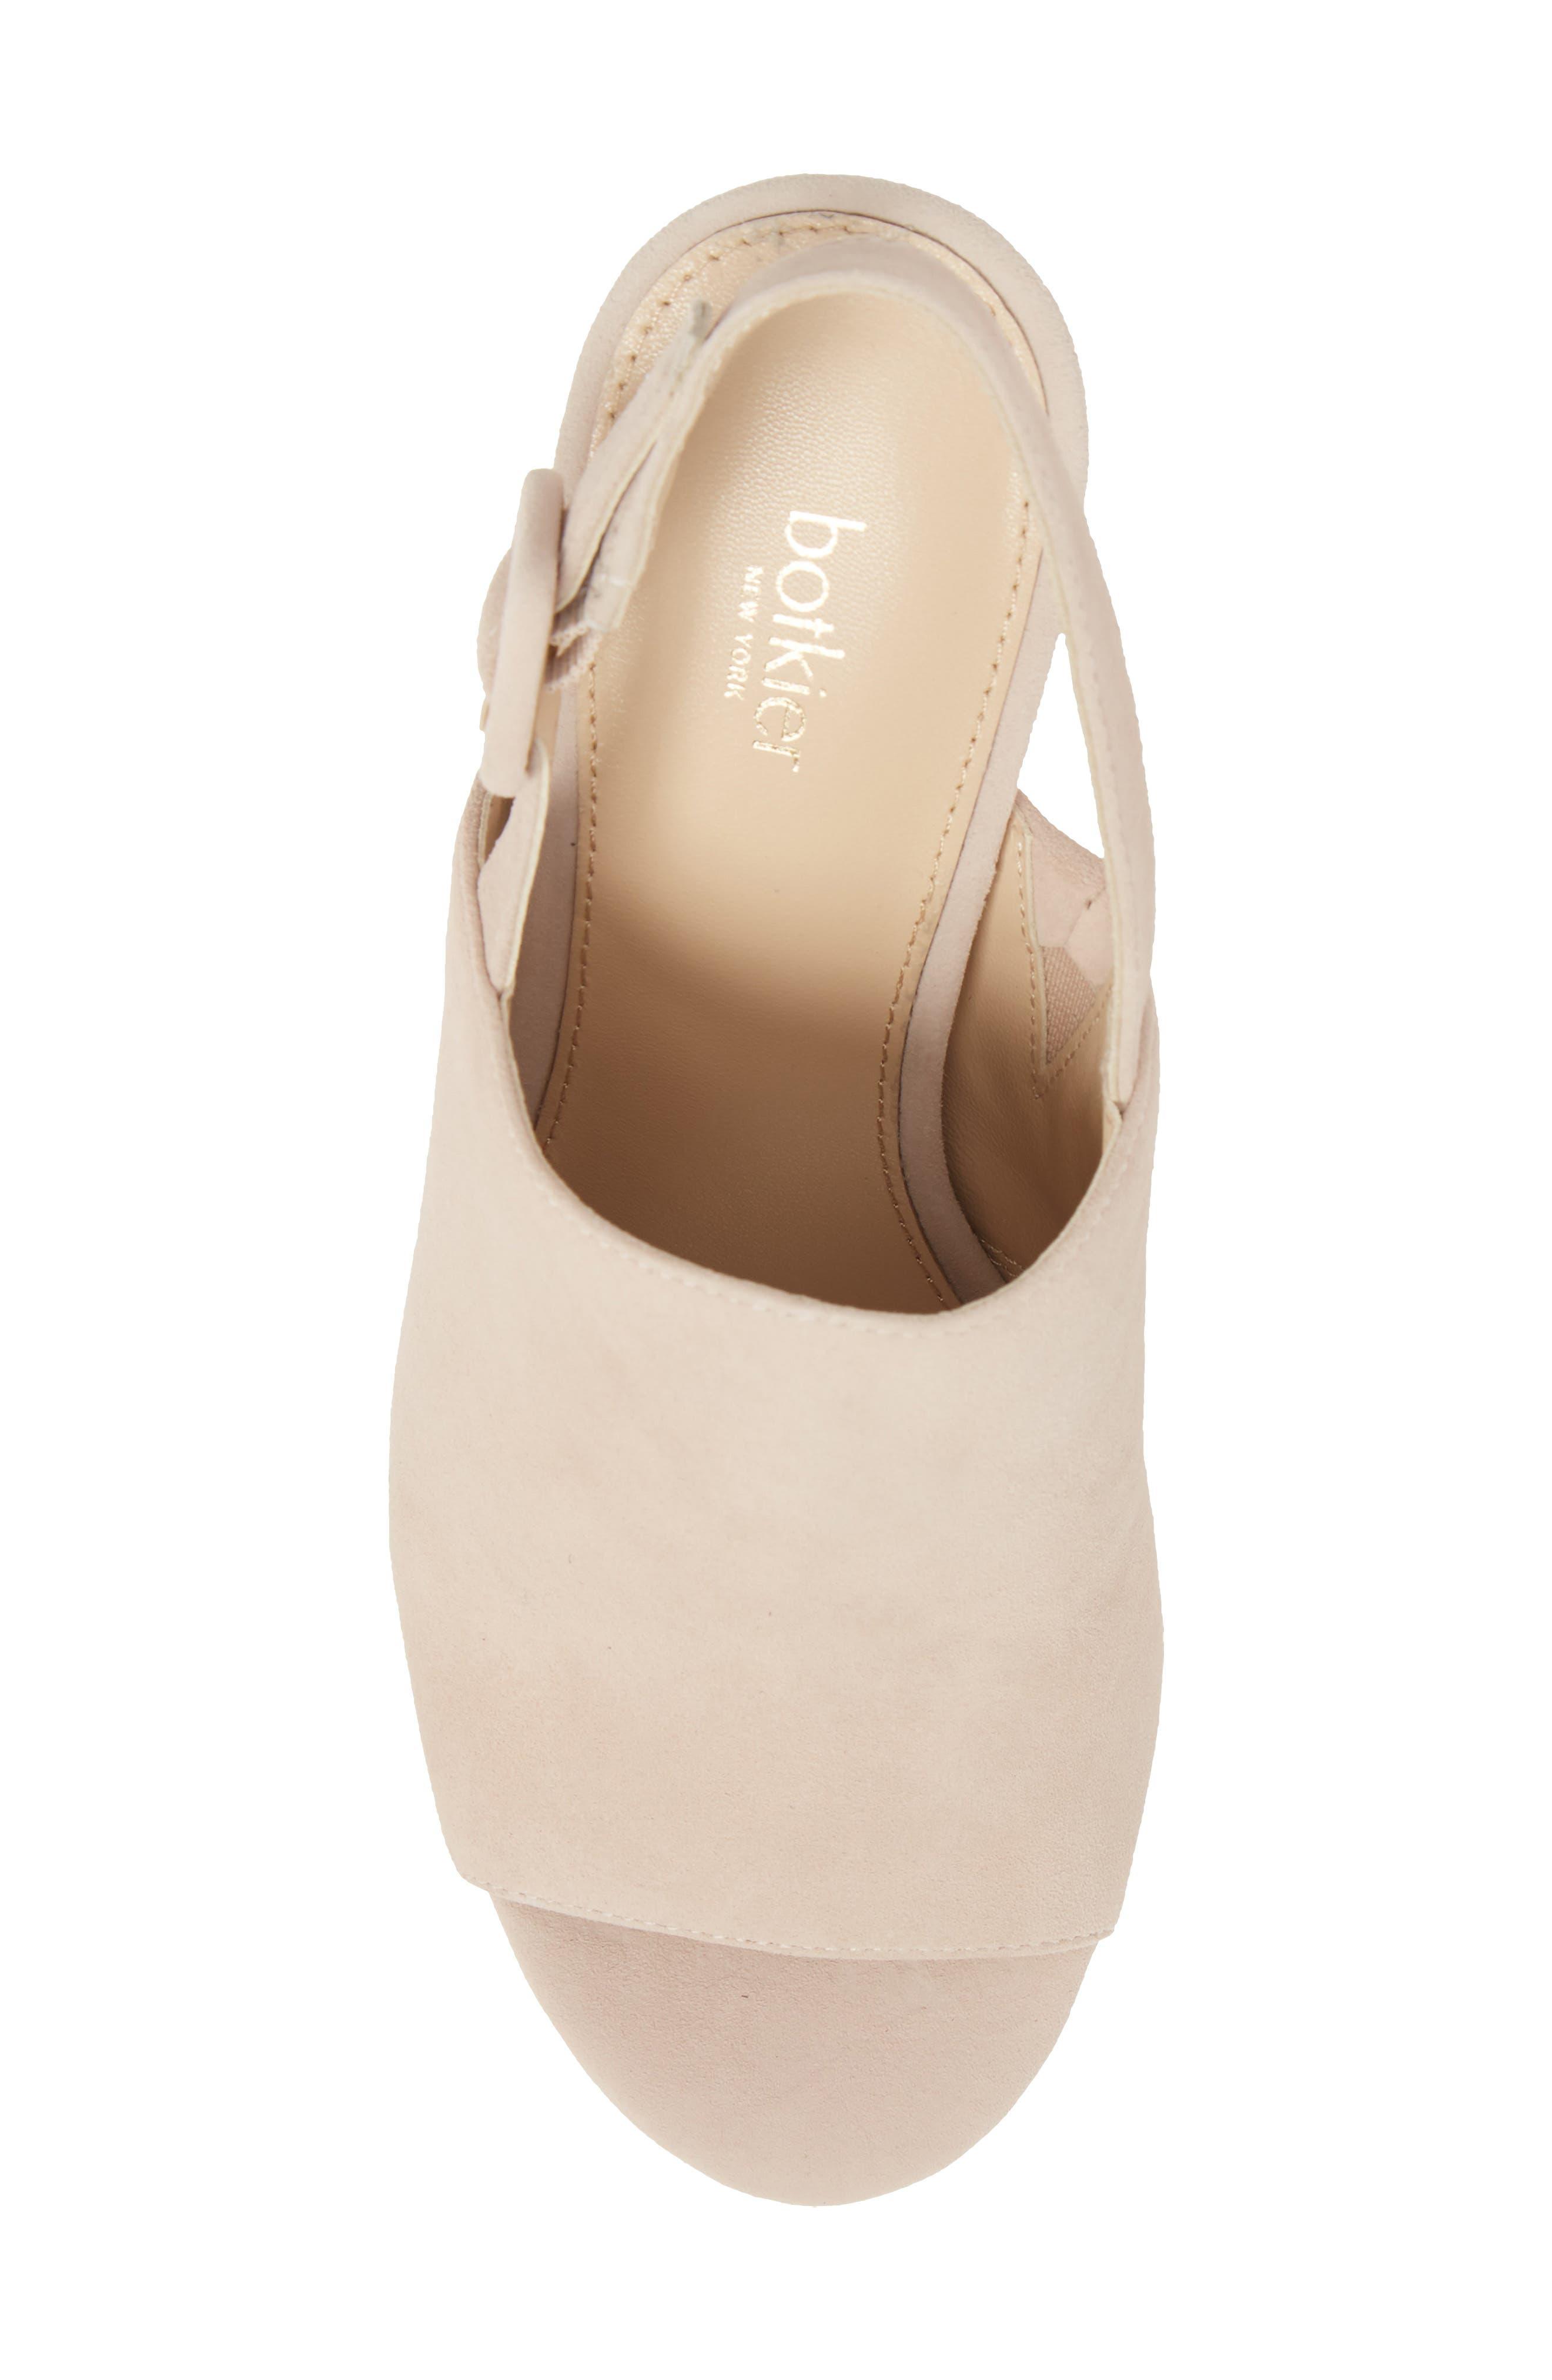 Jolene Platform Sandal,                             Alternate thumbnail 5, color,                             Blush Suede